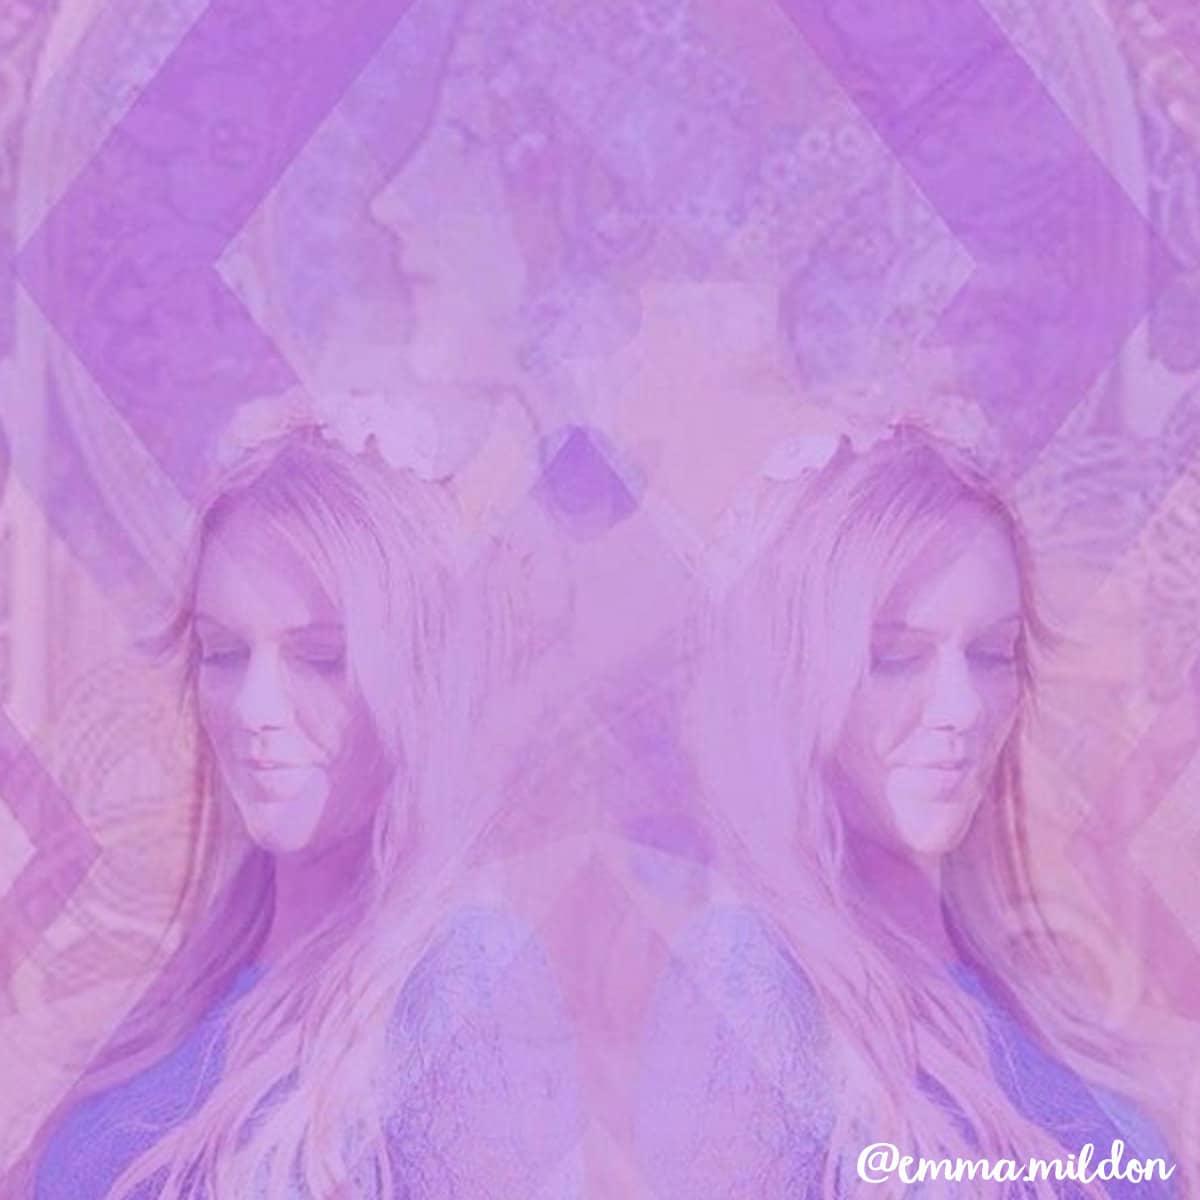 Emma Mildon - Spiritual Instagram Account